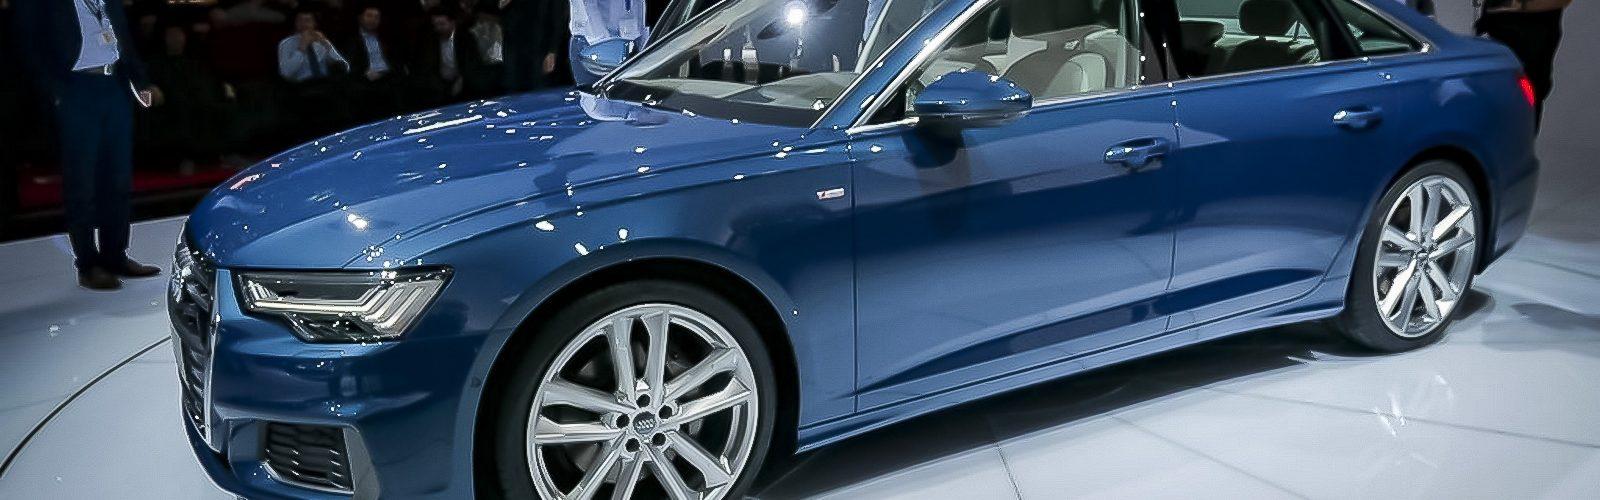 Geneve 2018 Audi LeNouvelAutomobiliste 08